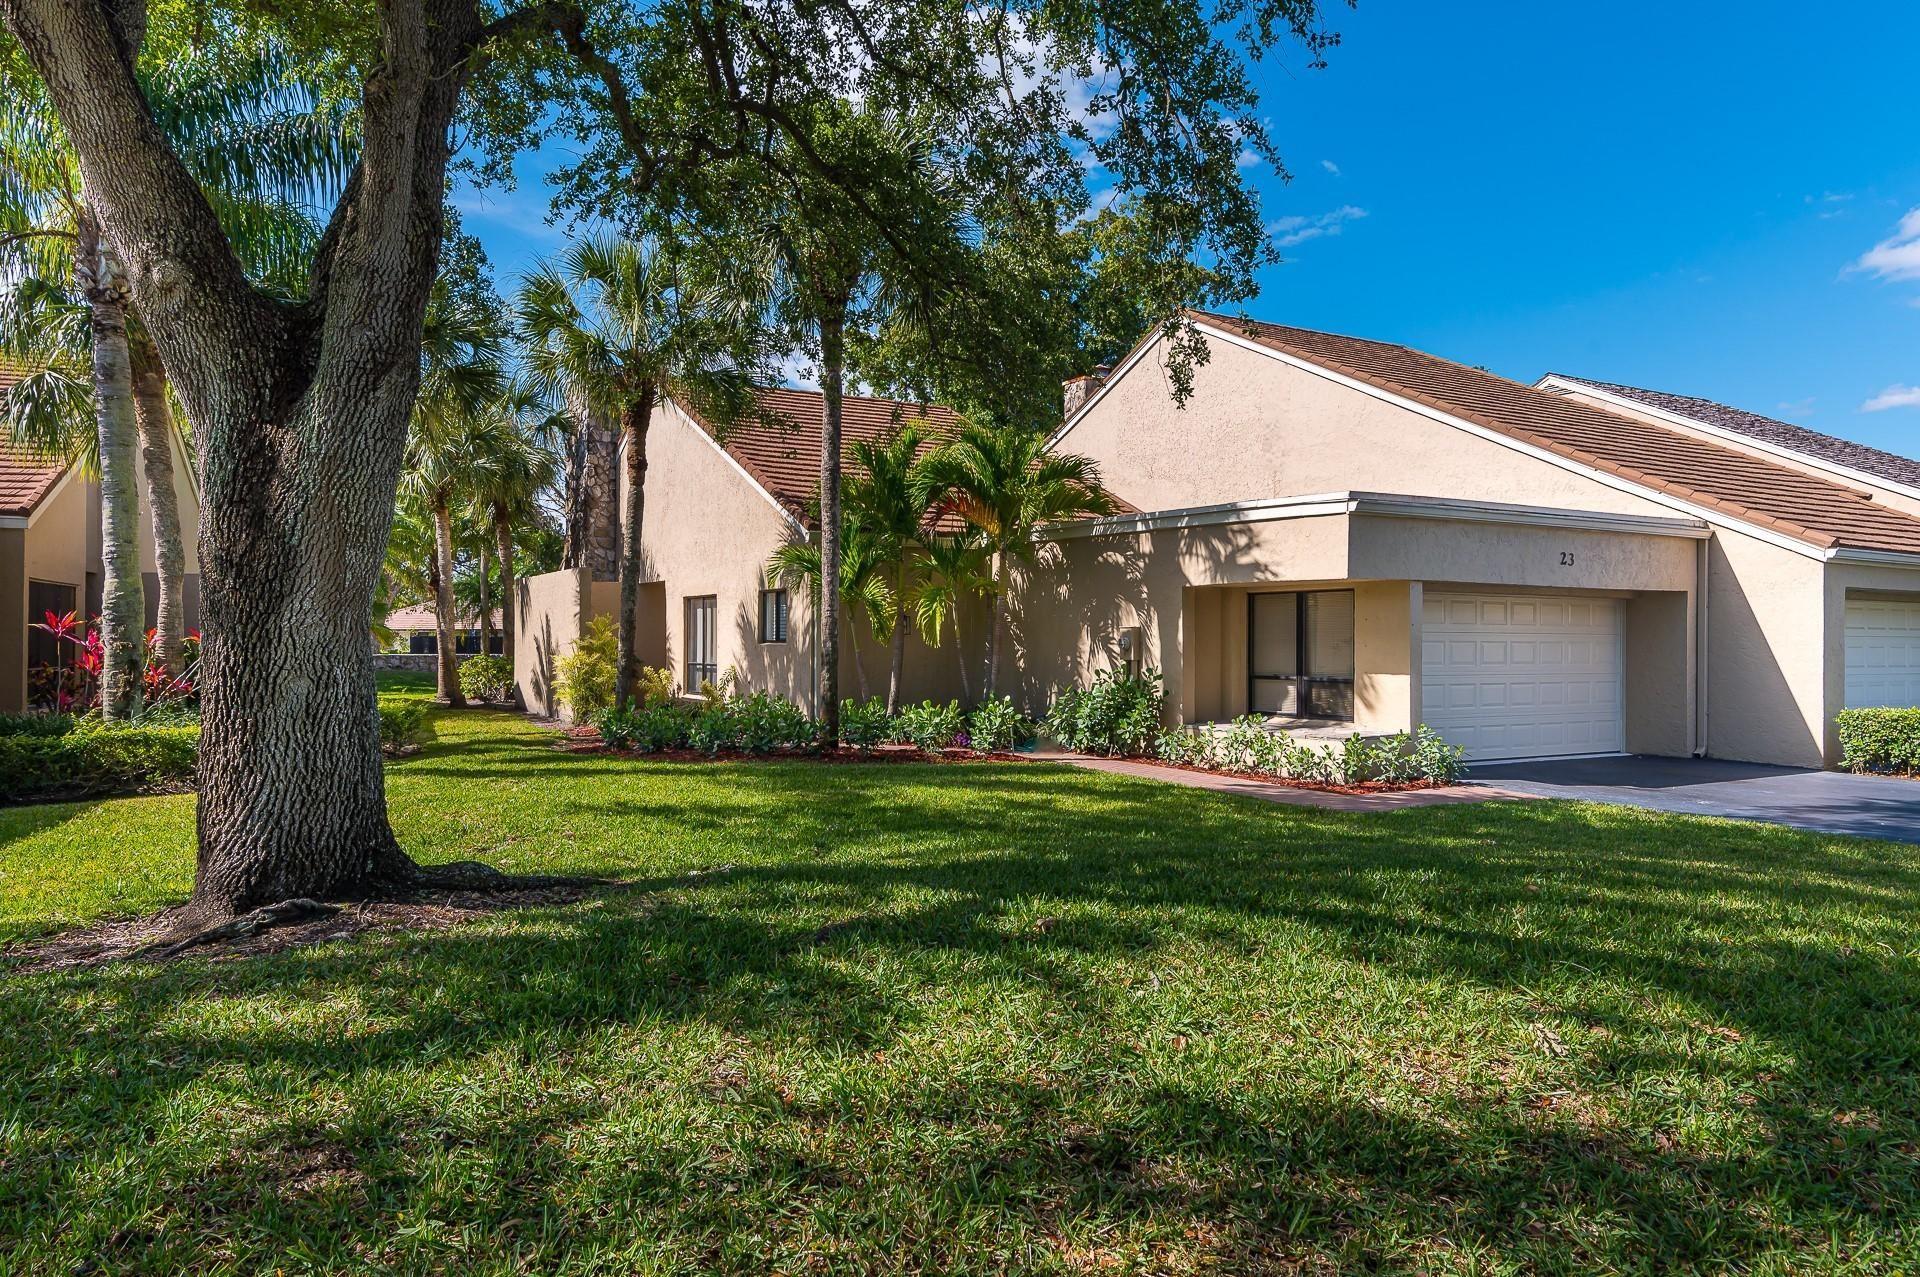 Photo of 23 Balfour Road W, Palm Beach Gardens, FL 33418 (MLS # RX-10709116)